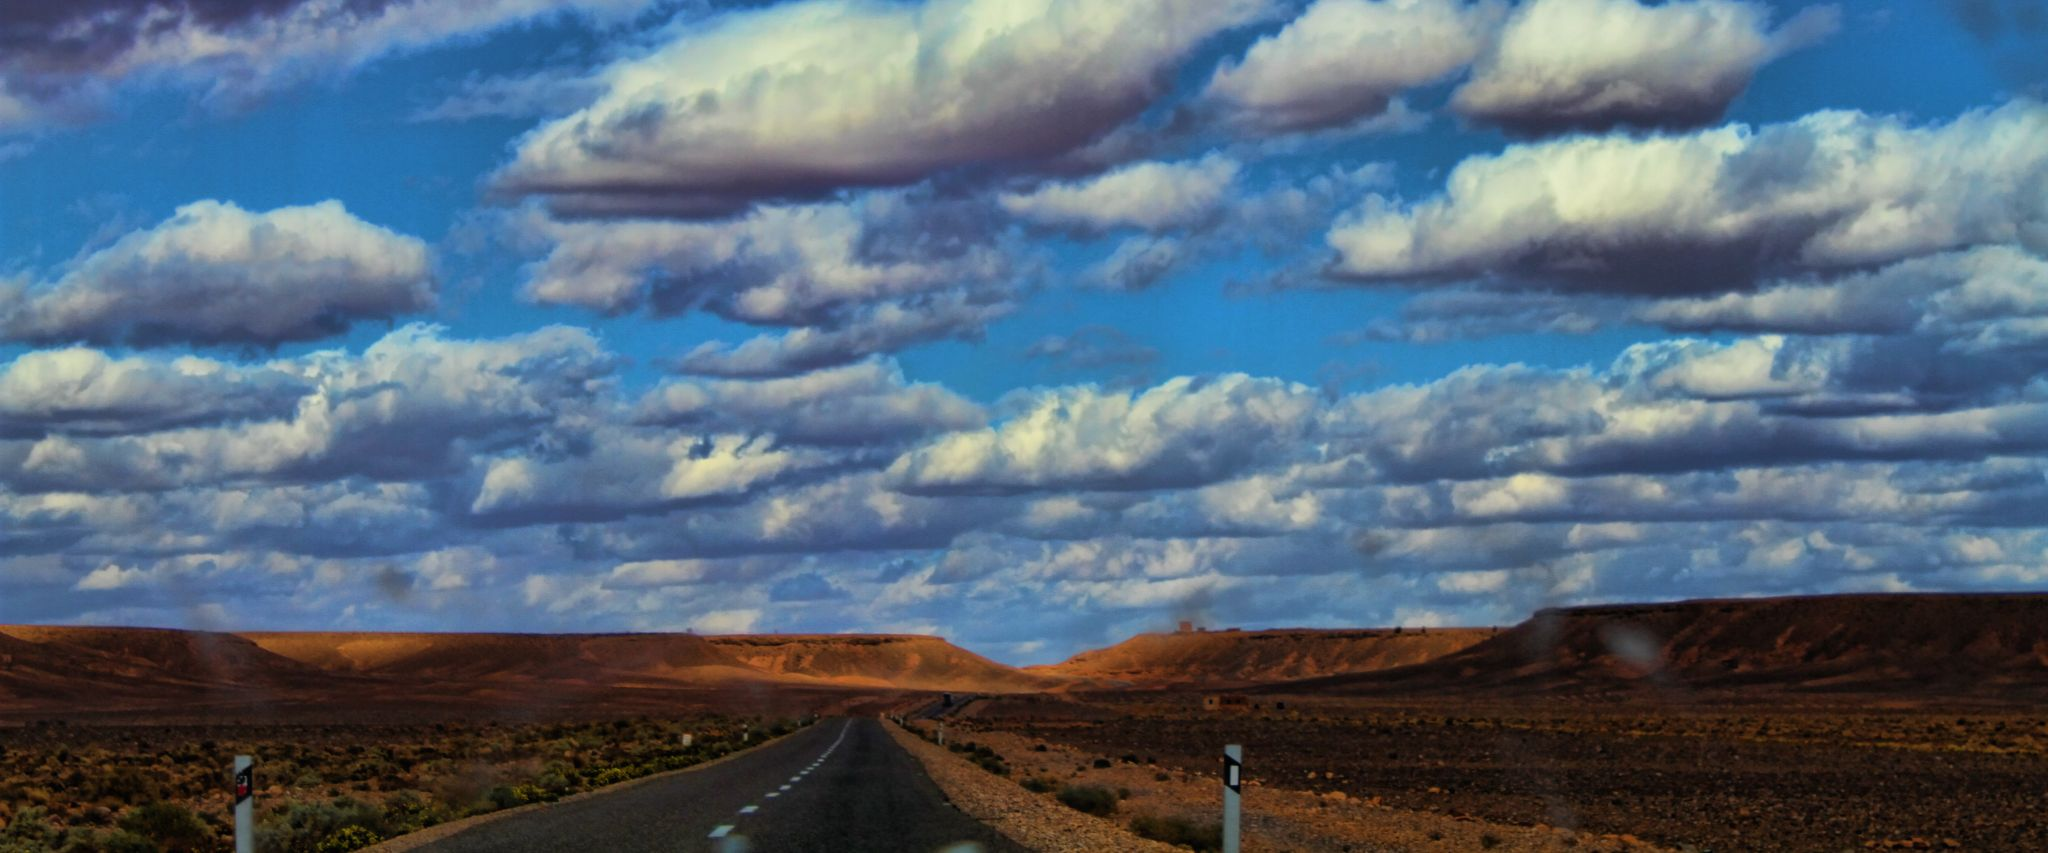 Cloudy sky by mohammedzakariae.noutfia